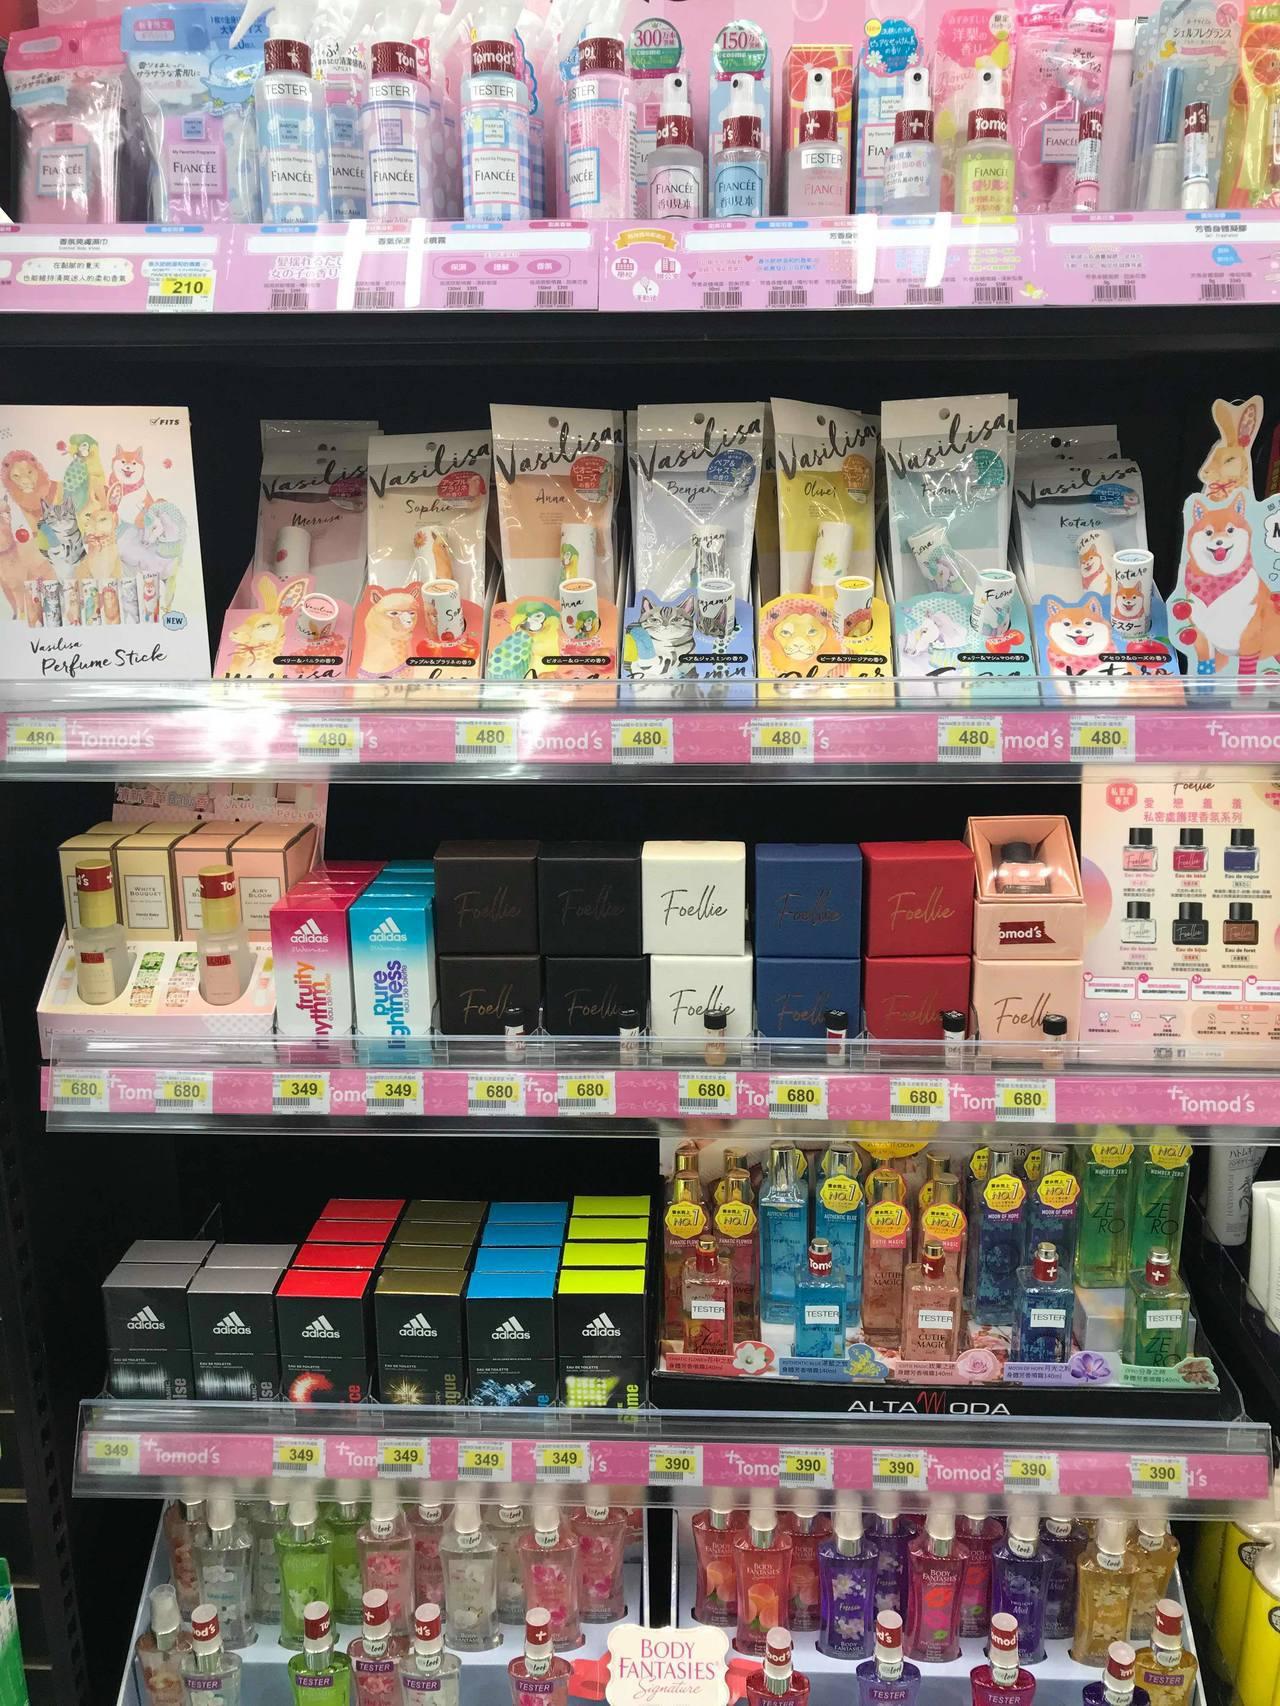 Tomod's台北ATT 4 FUN門市規畫了香氛櫃位,精選多款日韓話題熱銷香膏...